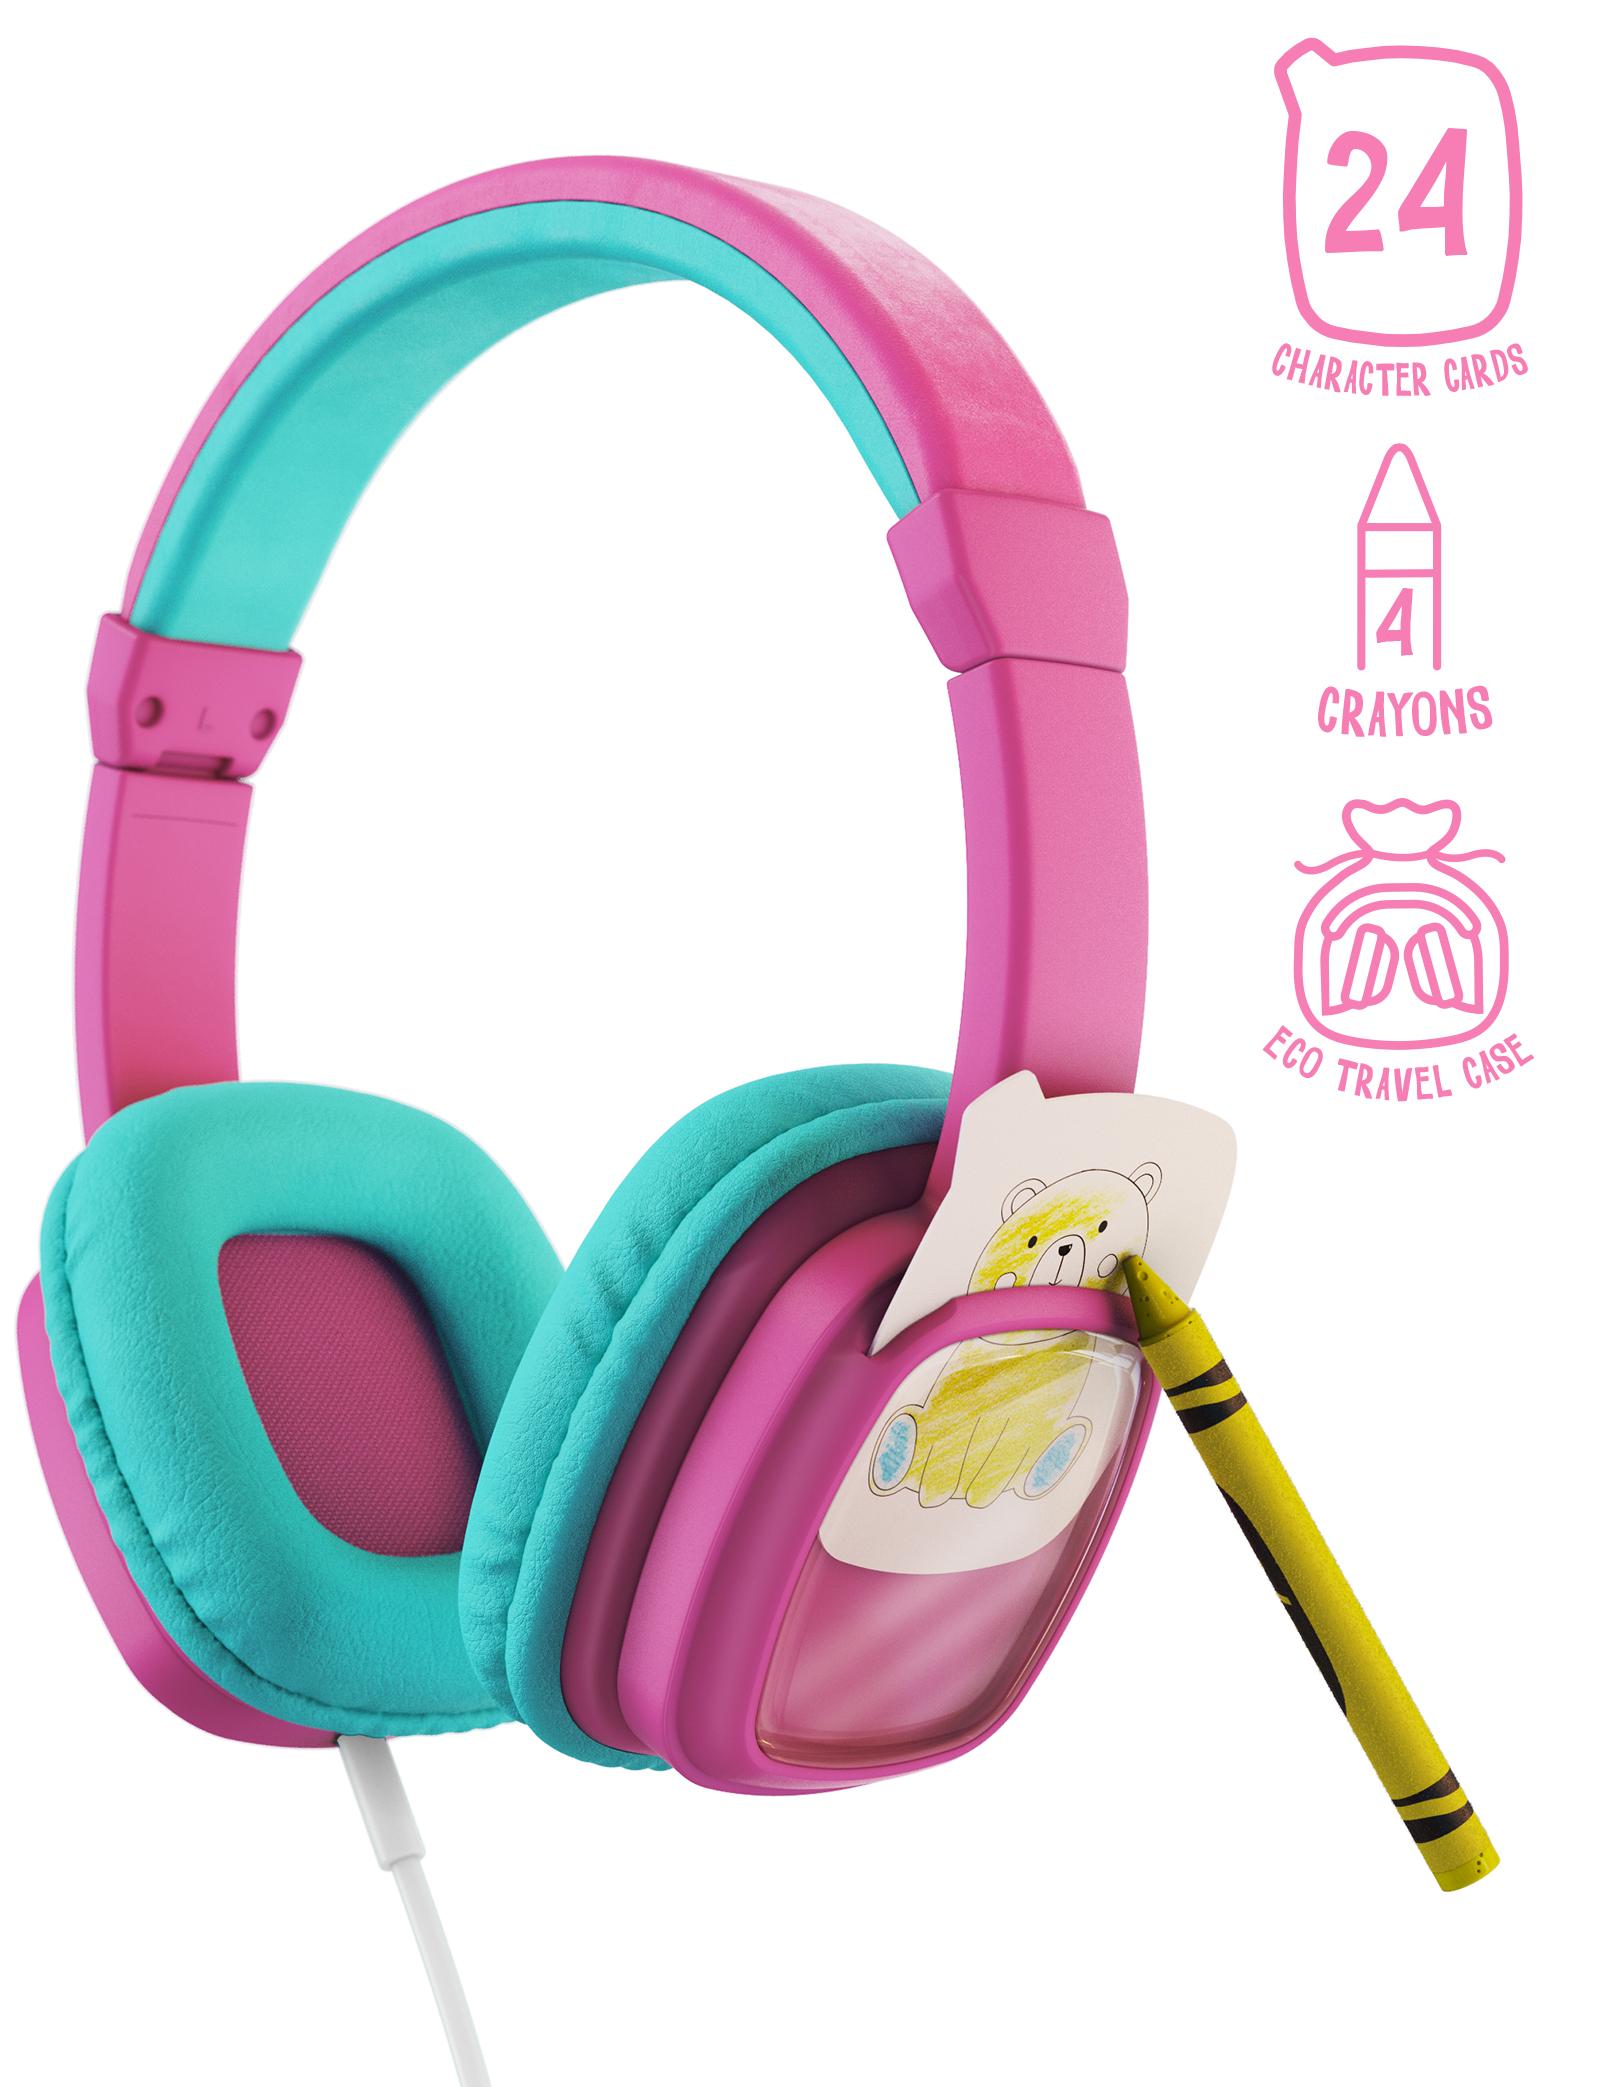 Planet Buddies Colour and Swap Kids Headphones